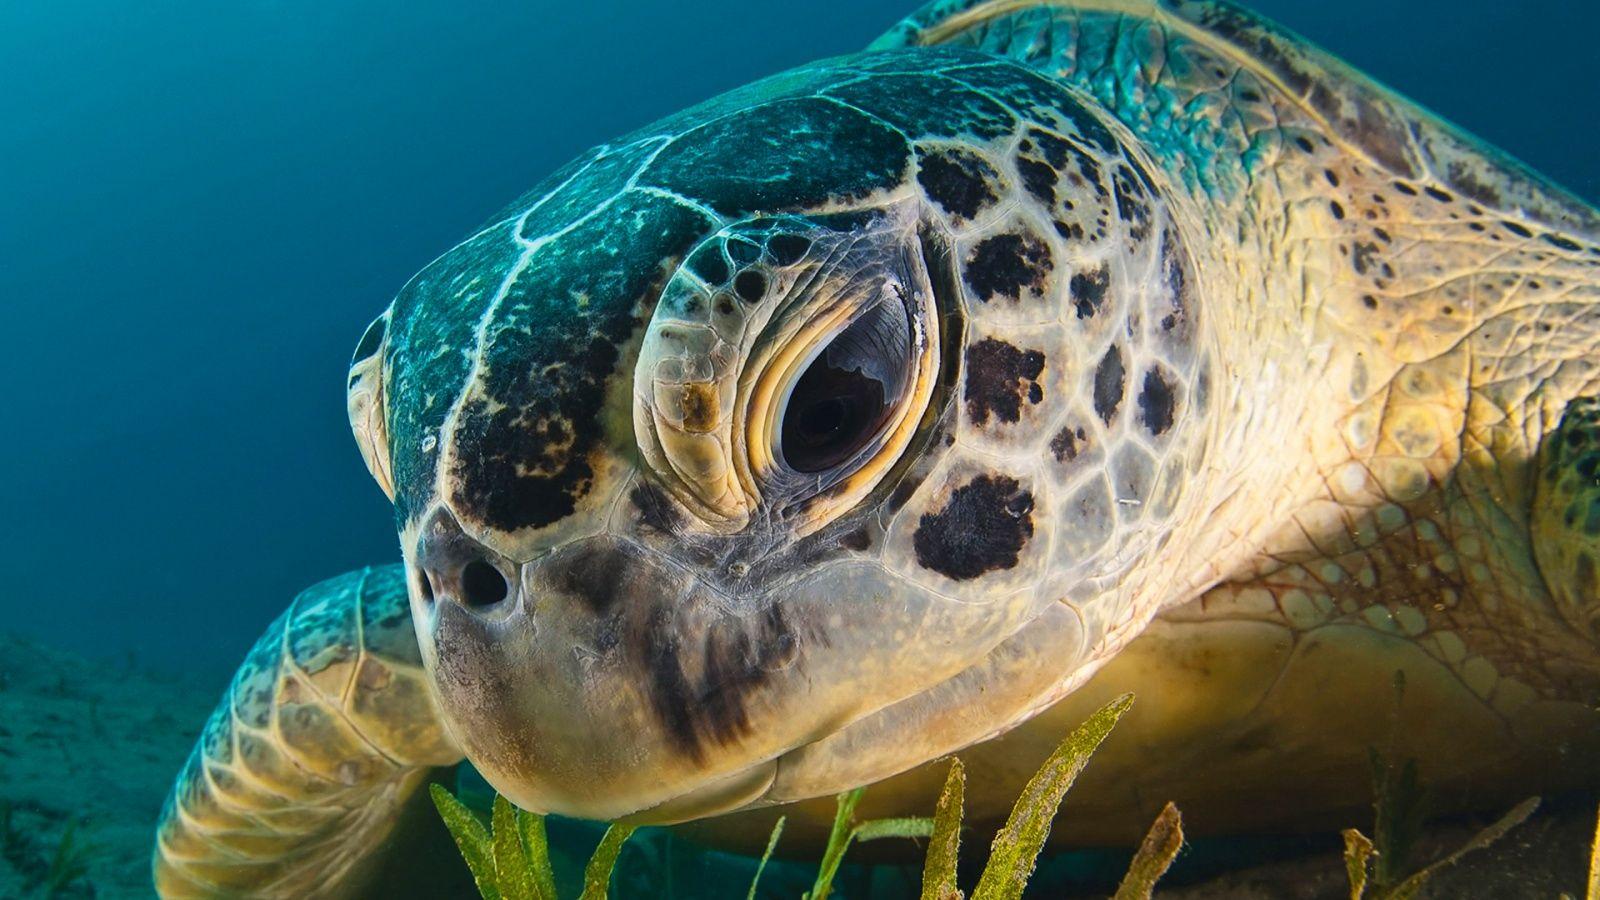 Sea turtle 1 Wallpaper in 1600x900 I Love Sea Turtles